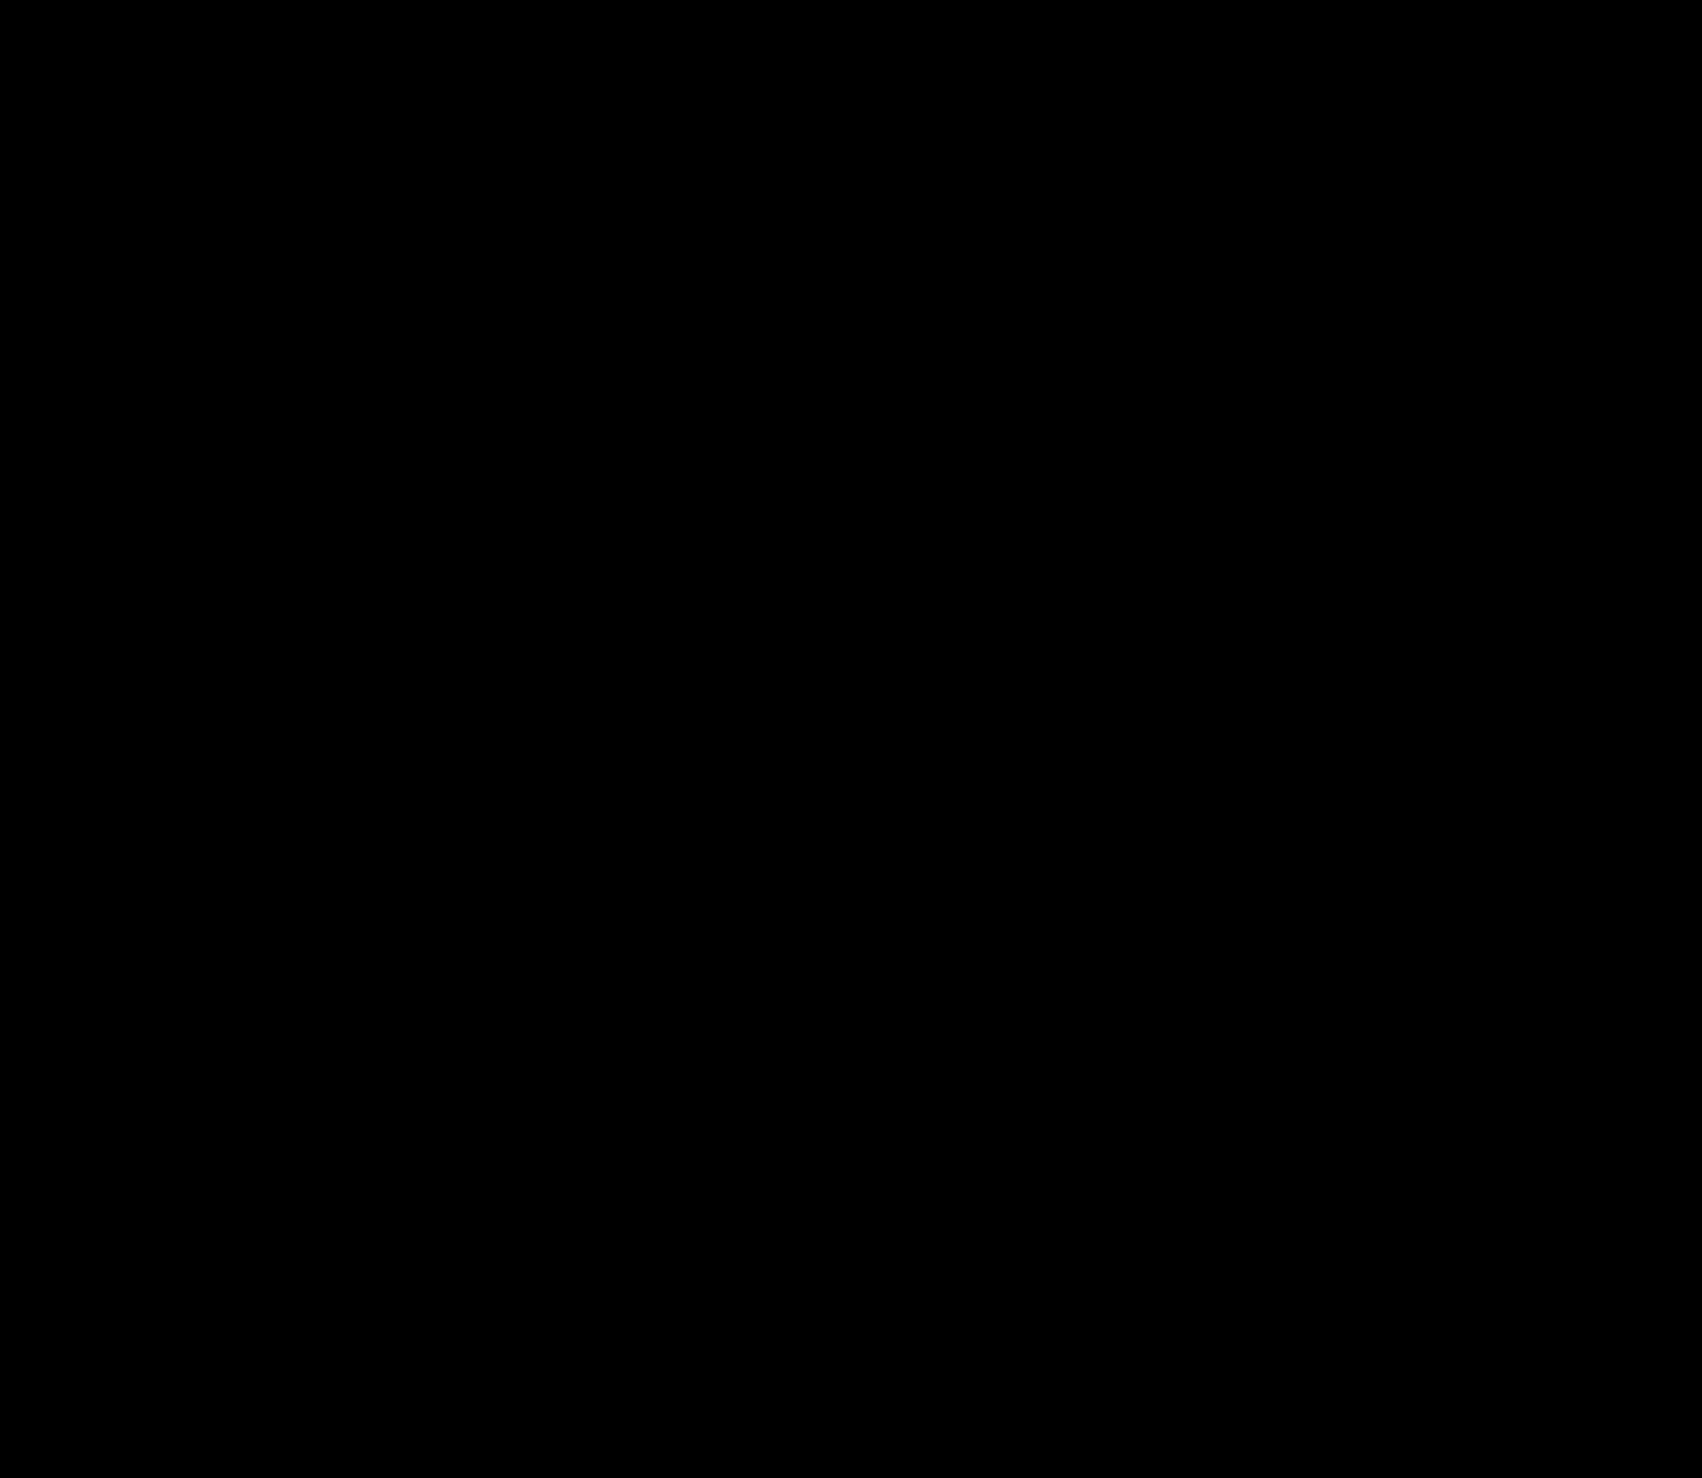 bnf-black-vert